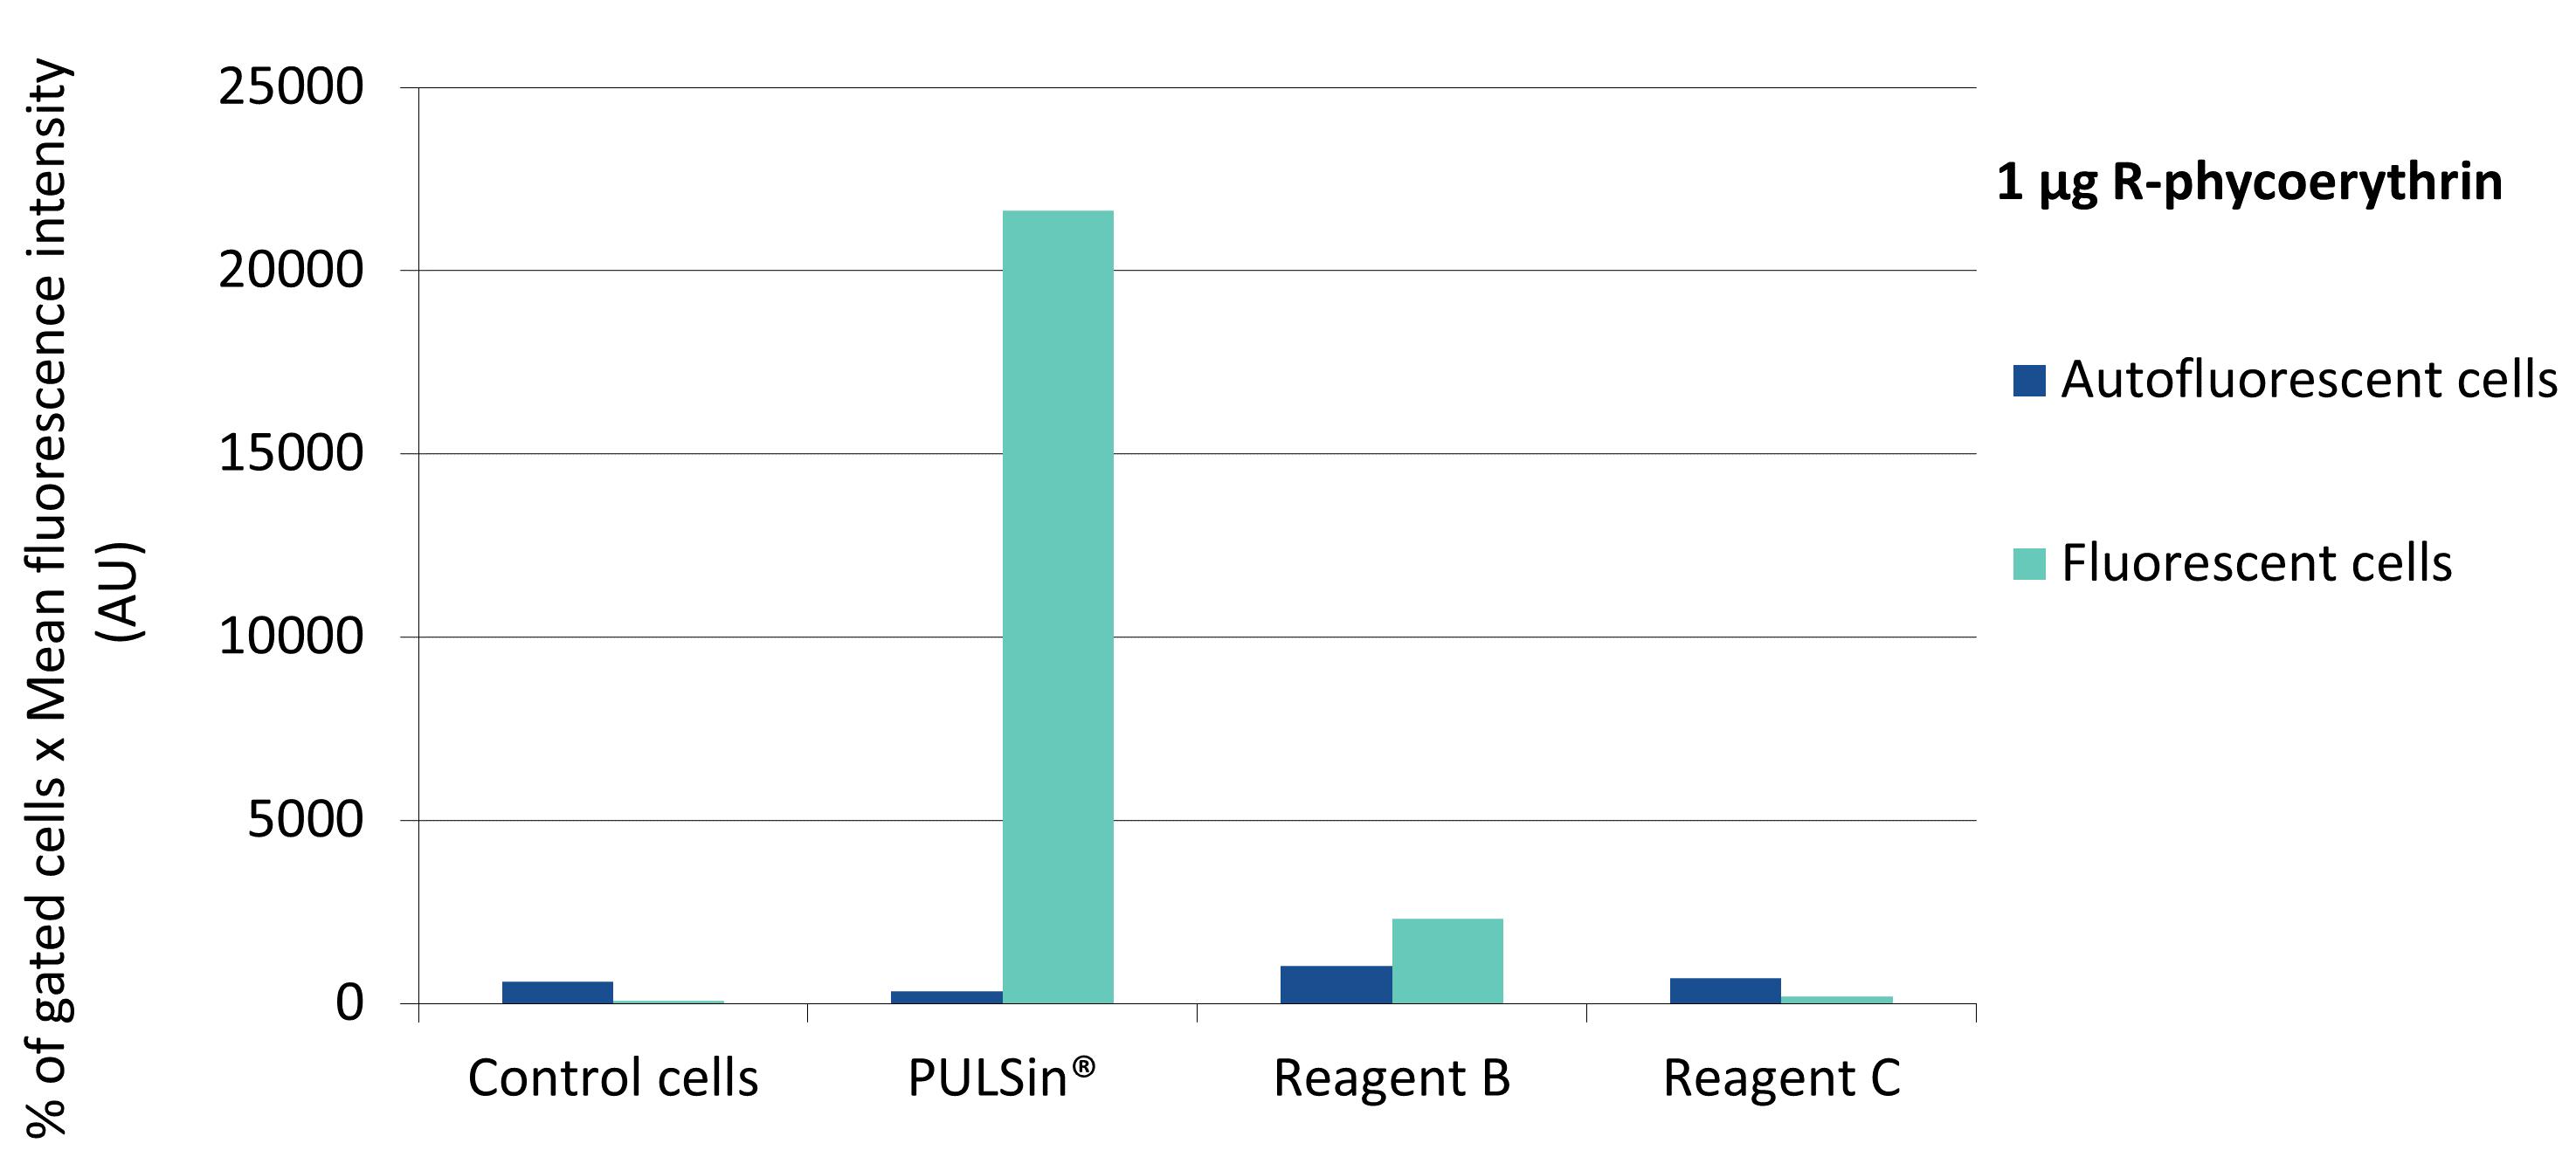 PULSin - Efficiency R-phycoerythrin